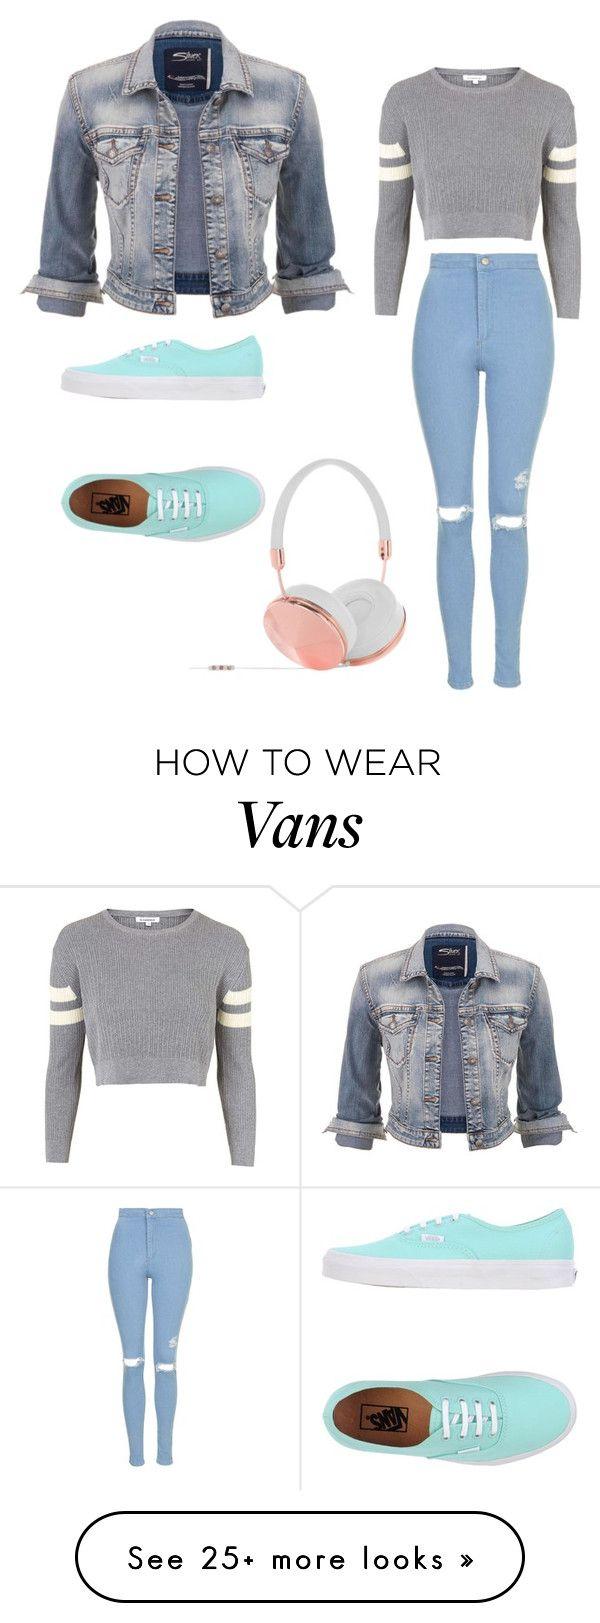 sweater gris, campera de jean, jean, zapas verde agua y audifonos rosas